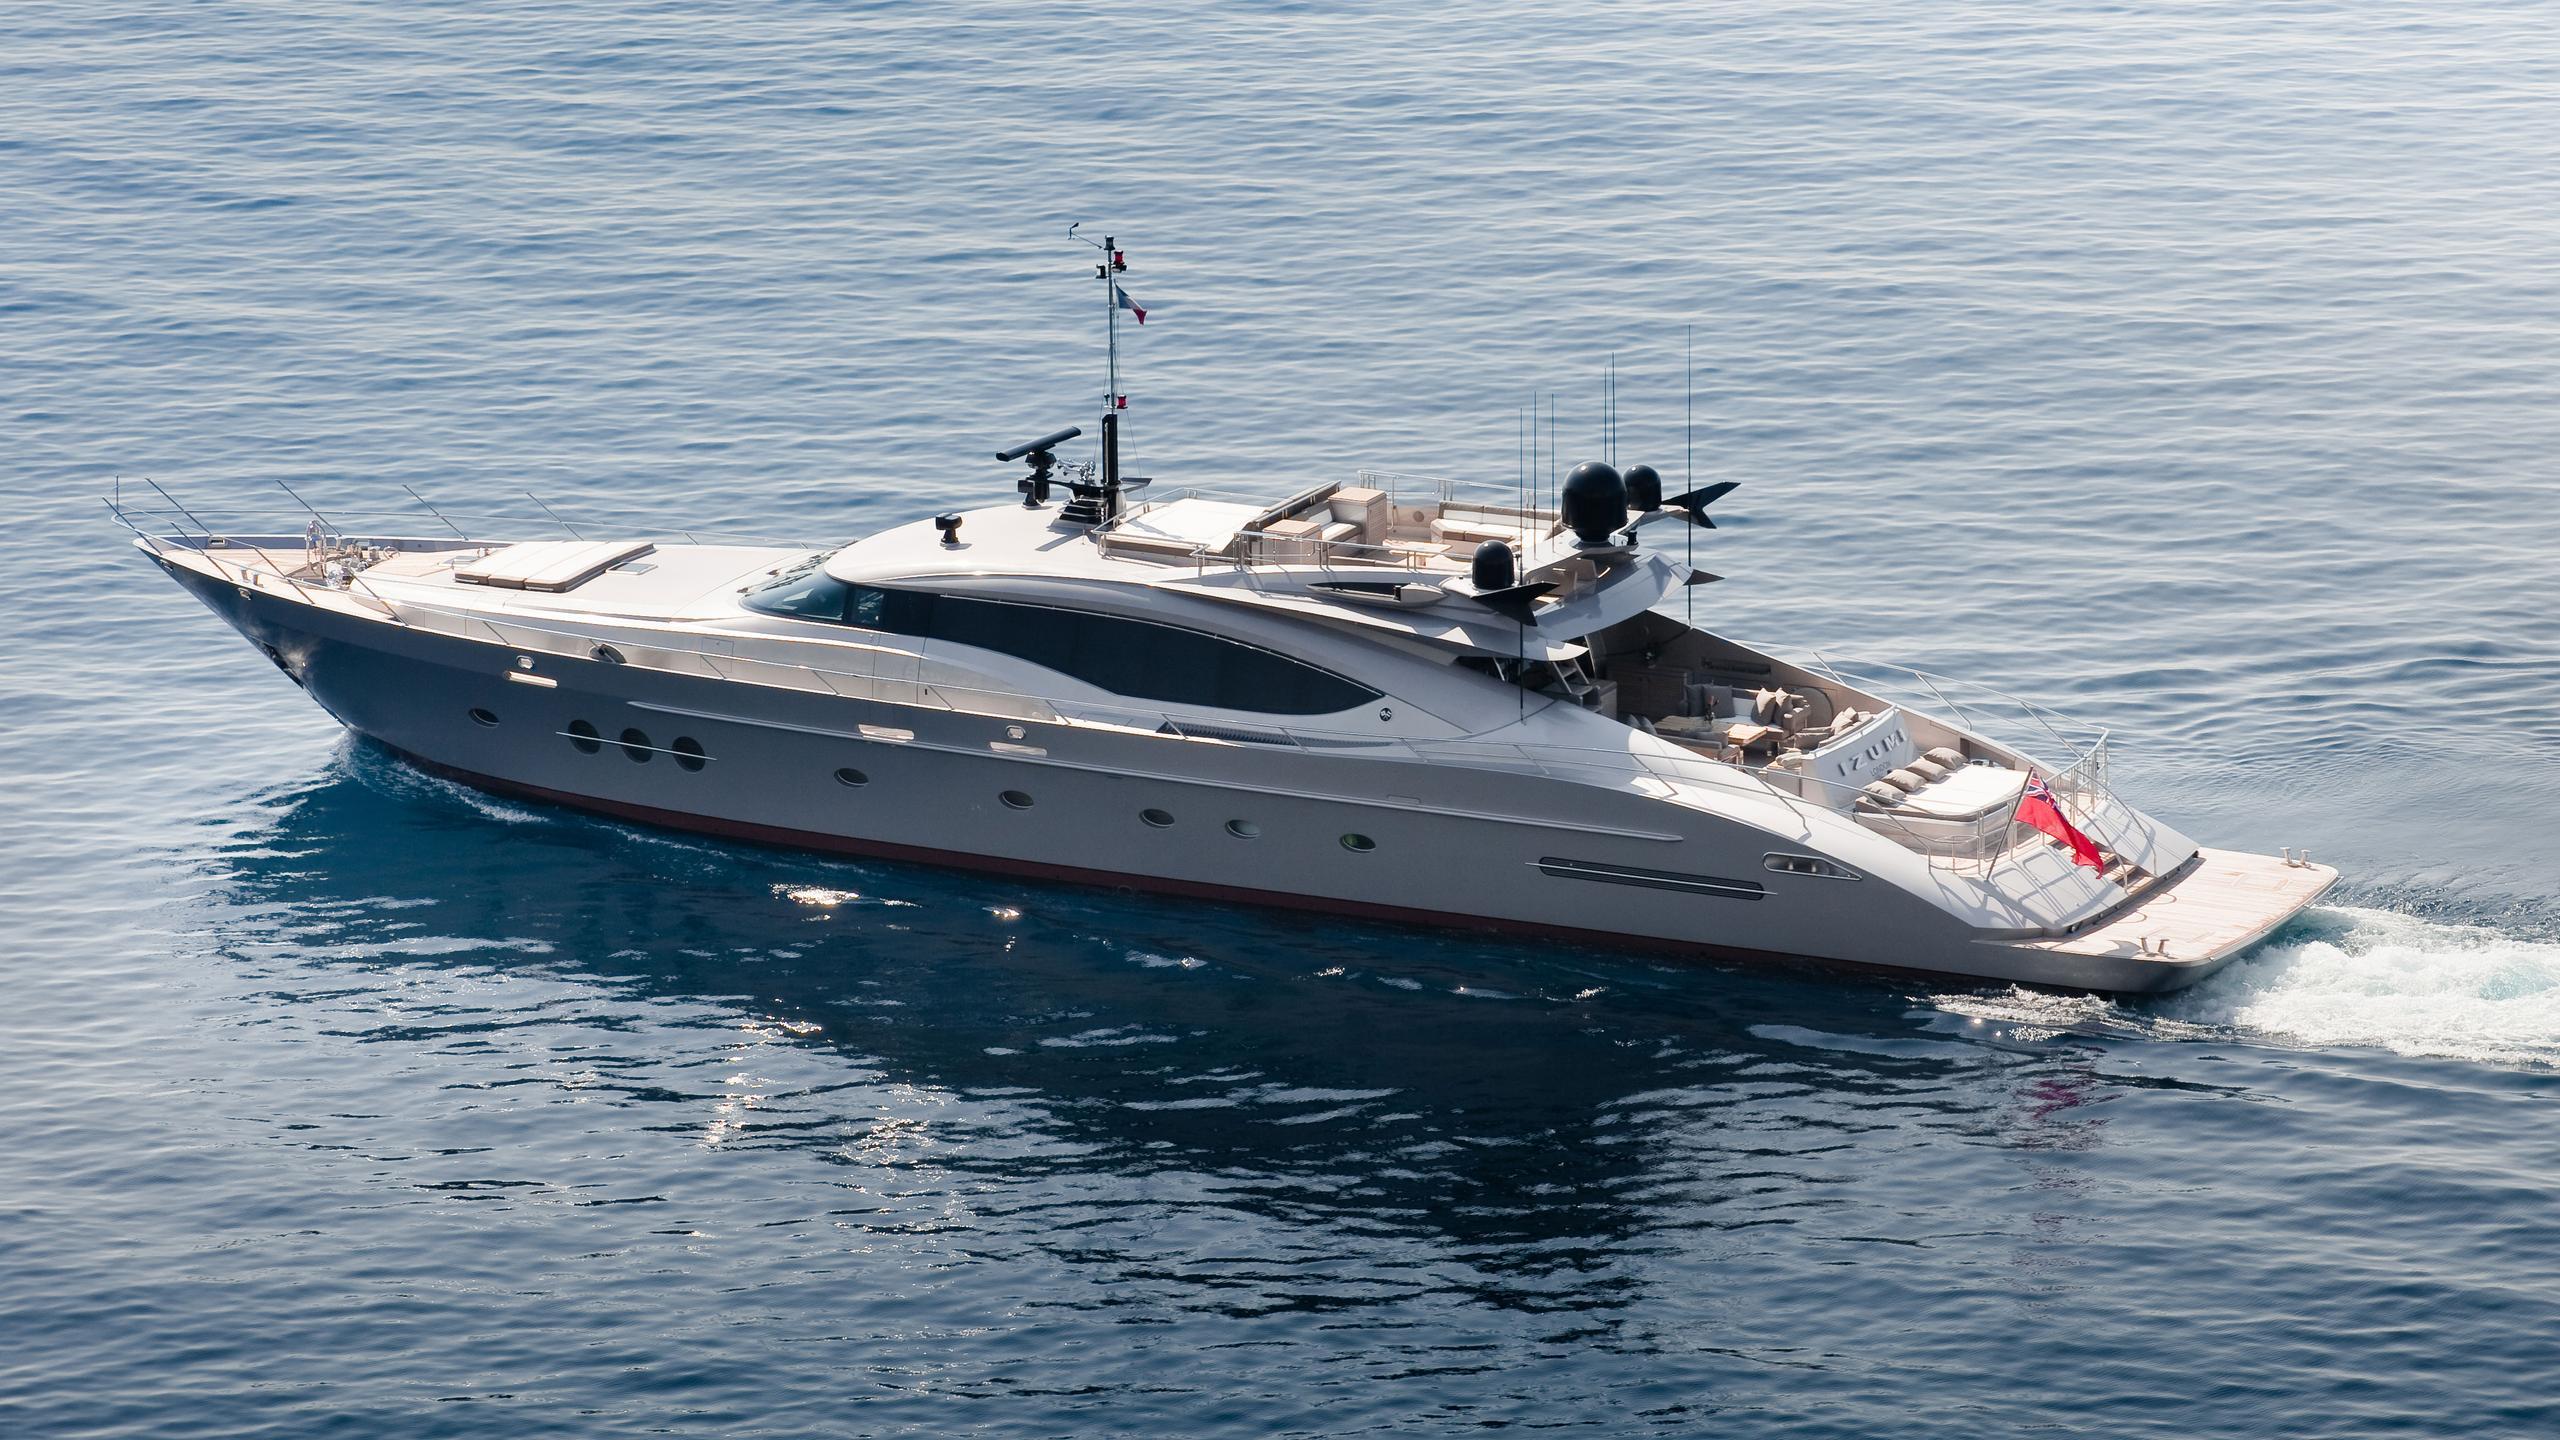 izumi-motor-yacht-palmer-johnson-120-my-2008-37m-aerial